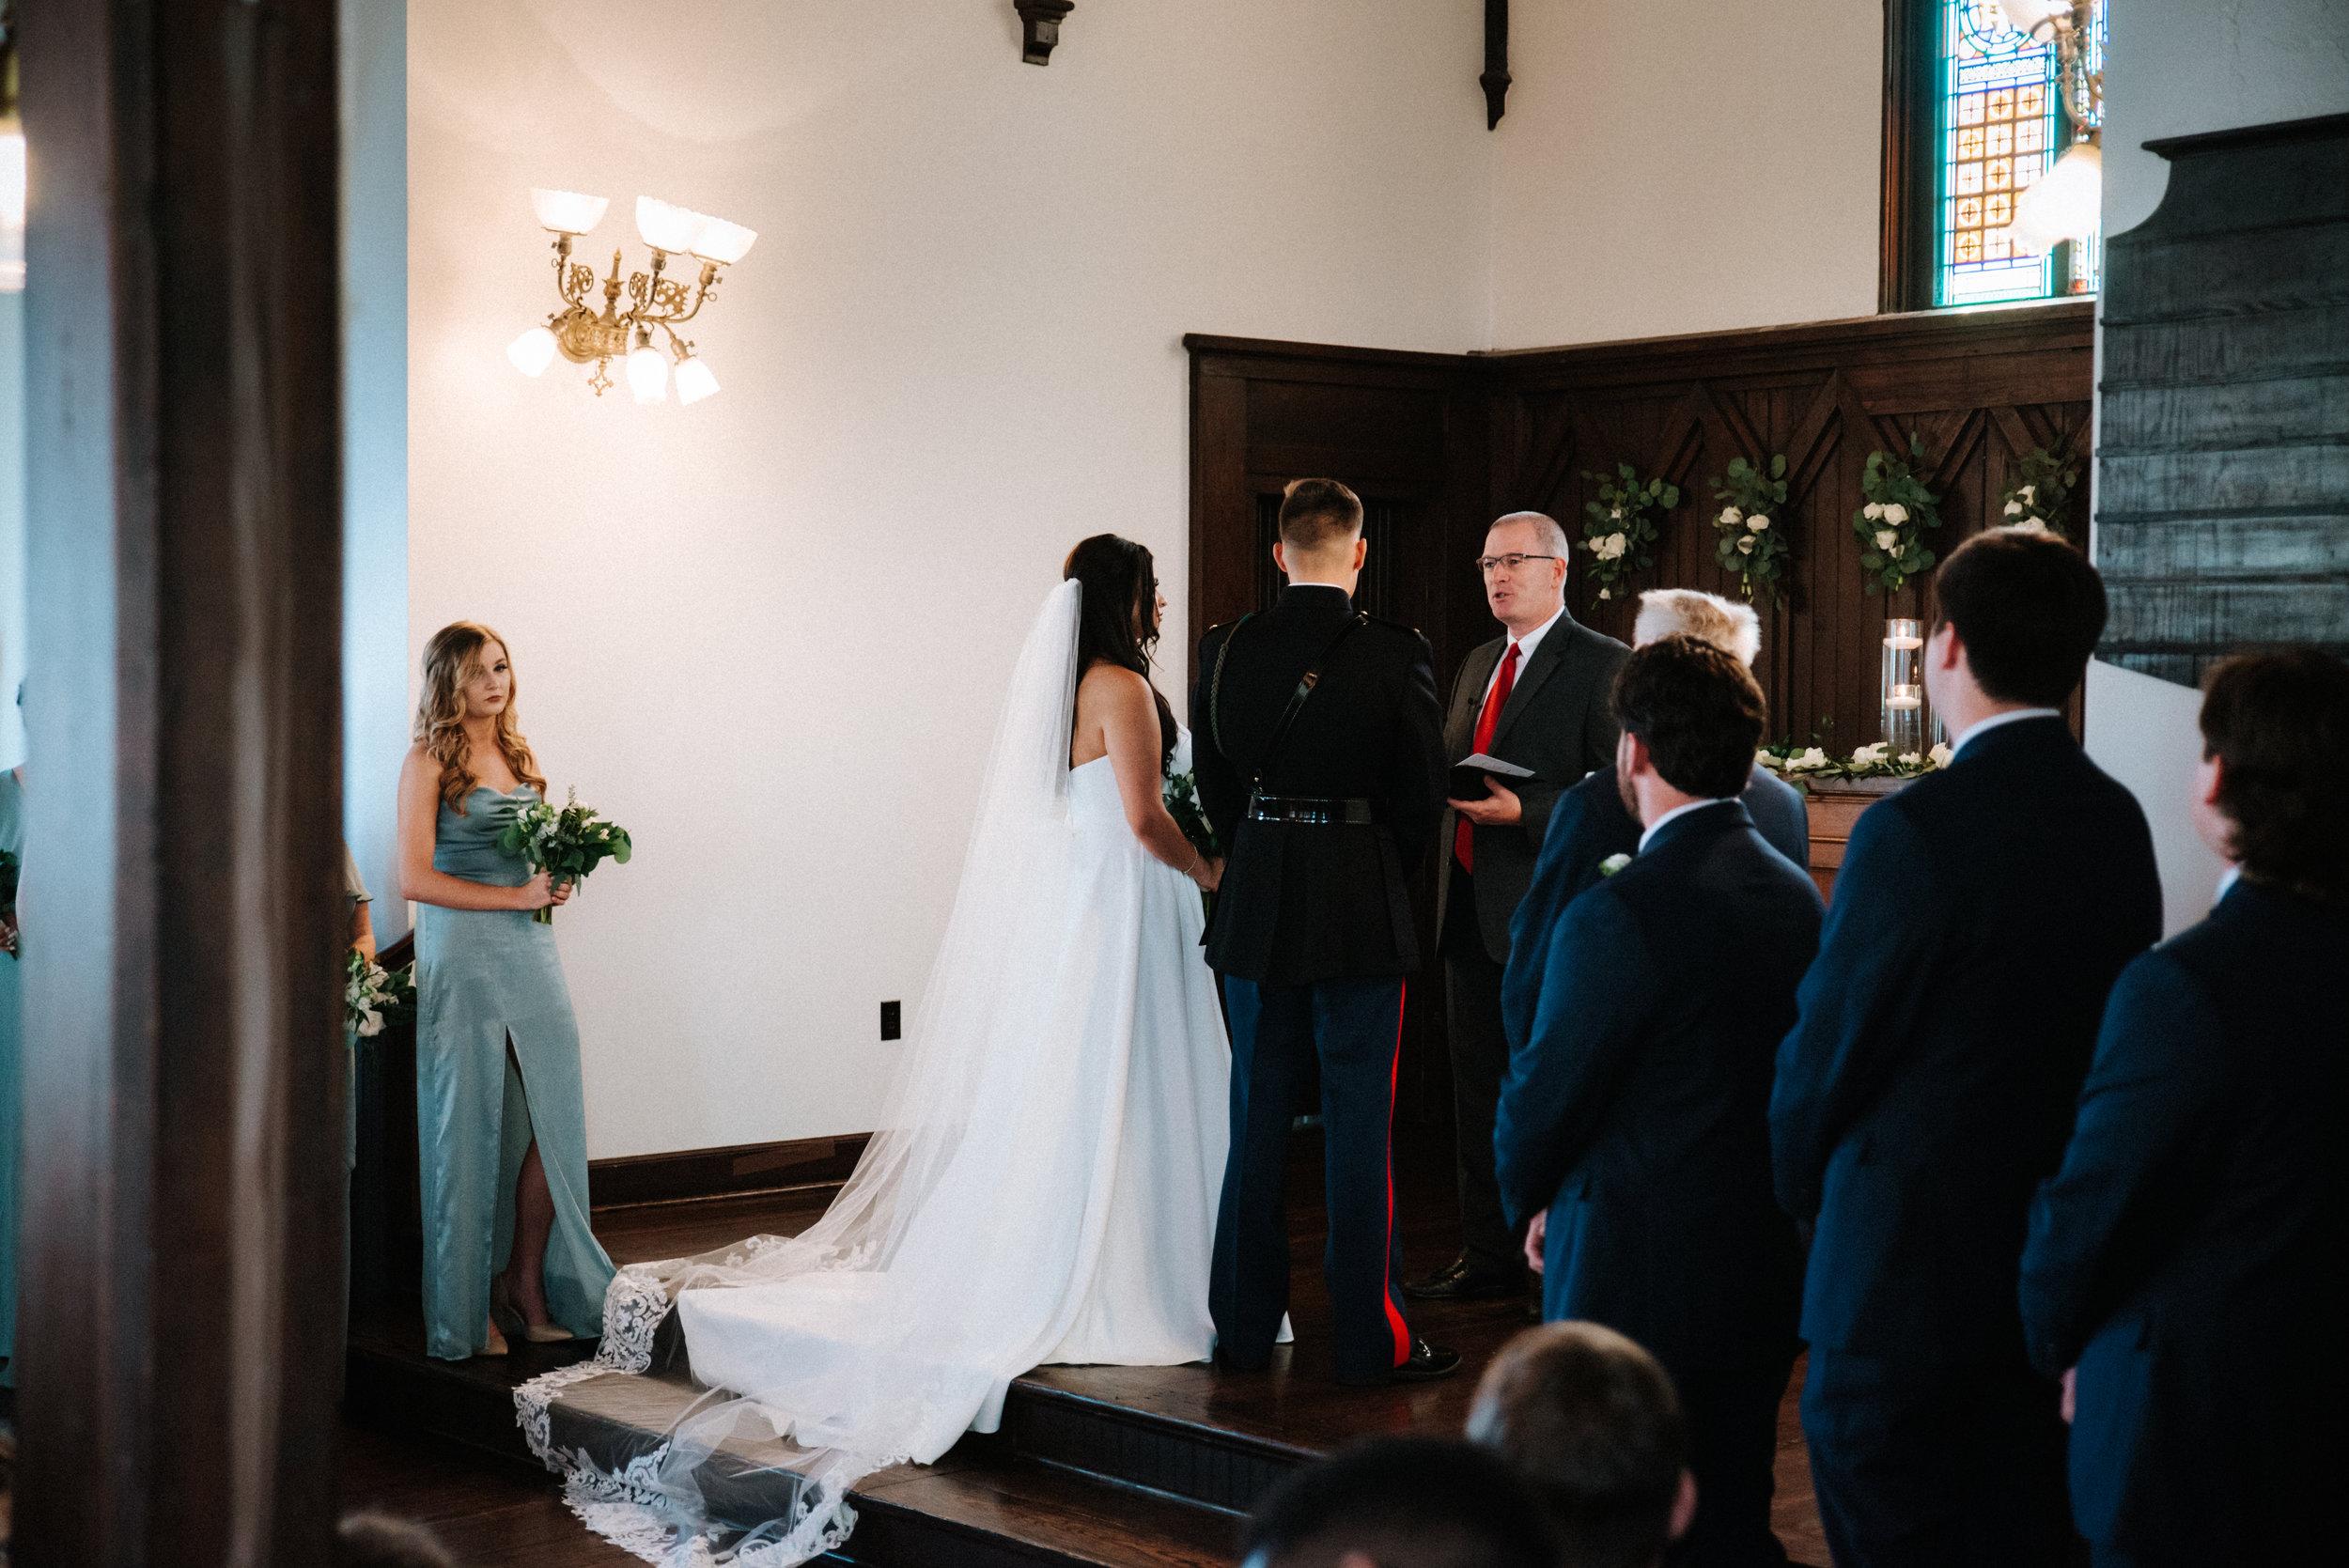 +Raleigh Wedding +North Carolina +Photographer +Wedding Photographer +Engagement Photographer +All Saints Chapel-6755.jpg